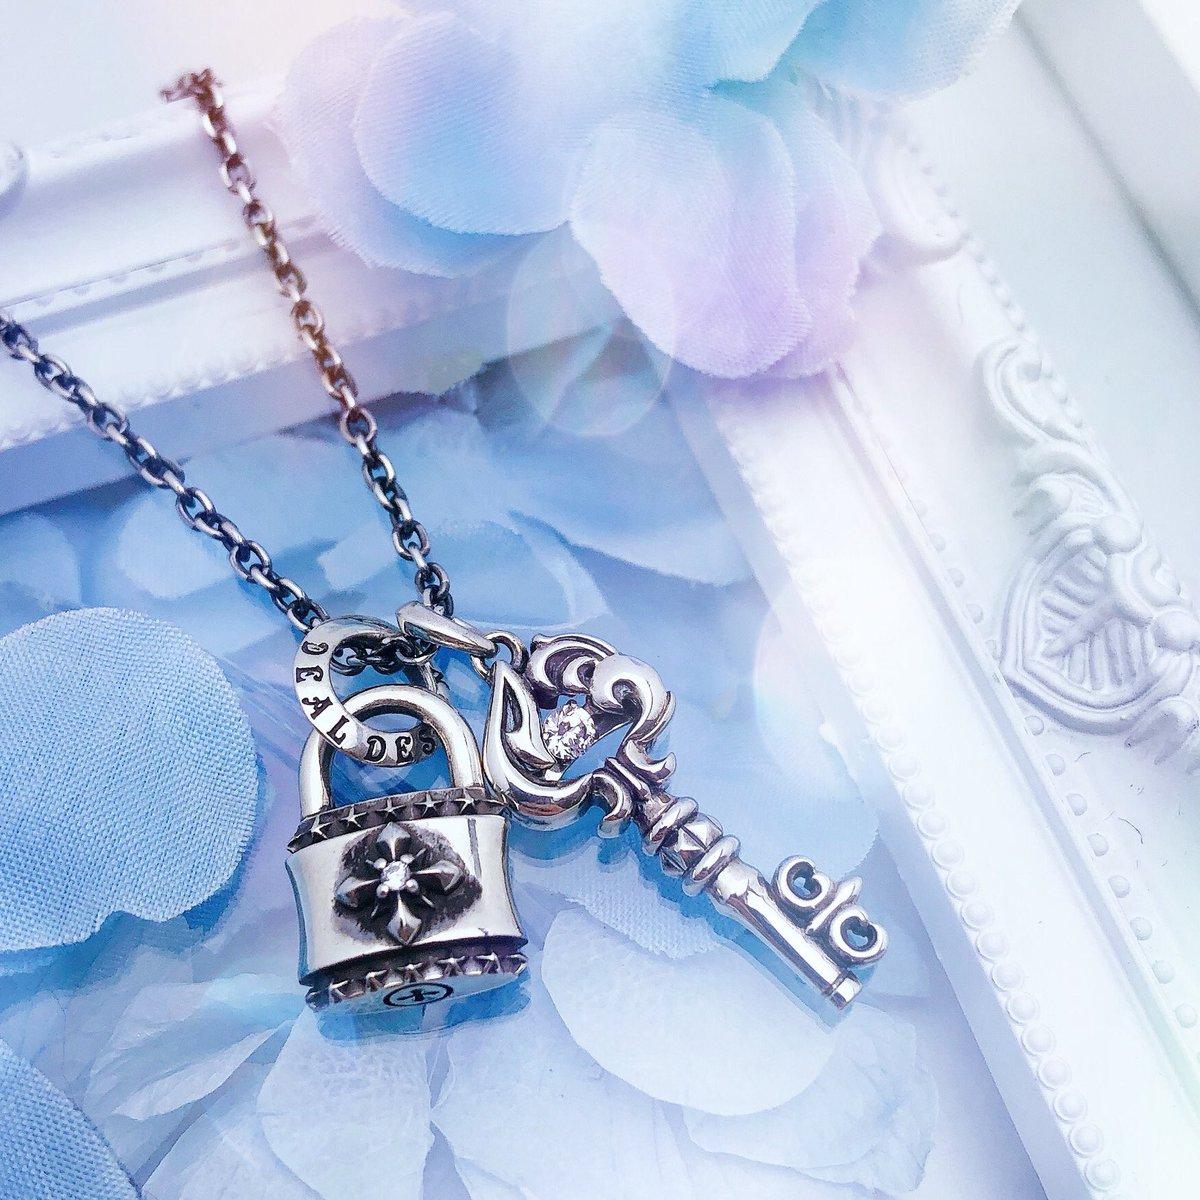 SELECT KEY TOP : ACE DANCING STONE  SPIKE CROSS PADLOCK  #dealdesign #silver925 #silverjewelry #design #accessory #handmade  #necklace #spade #stone #padlock #dancingstone #fashion #style #model #cute #pair #gift #followme #instalike #ootd